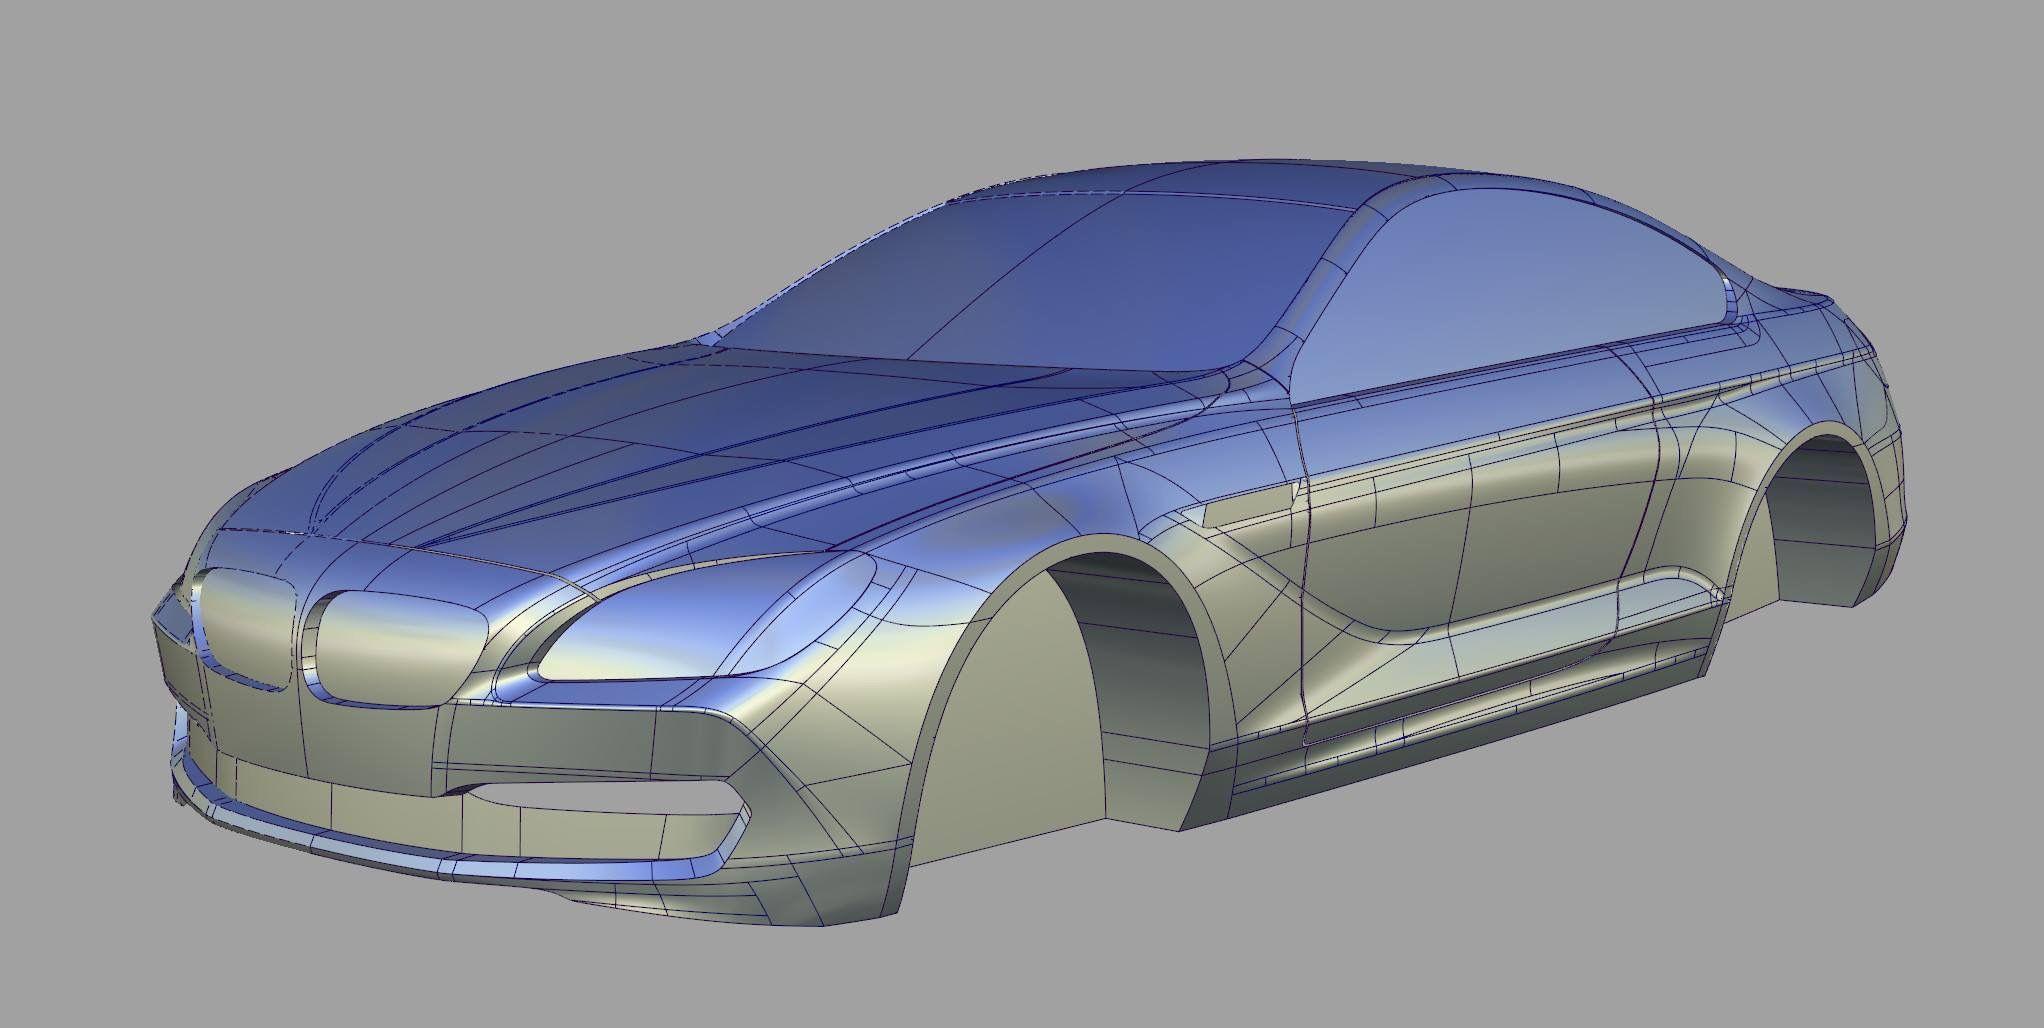 Bmw Alias 3d Model Automotive Design Design Model Car Model